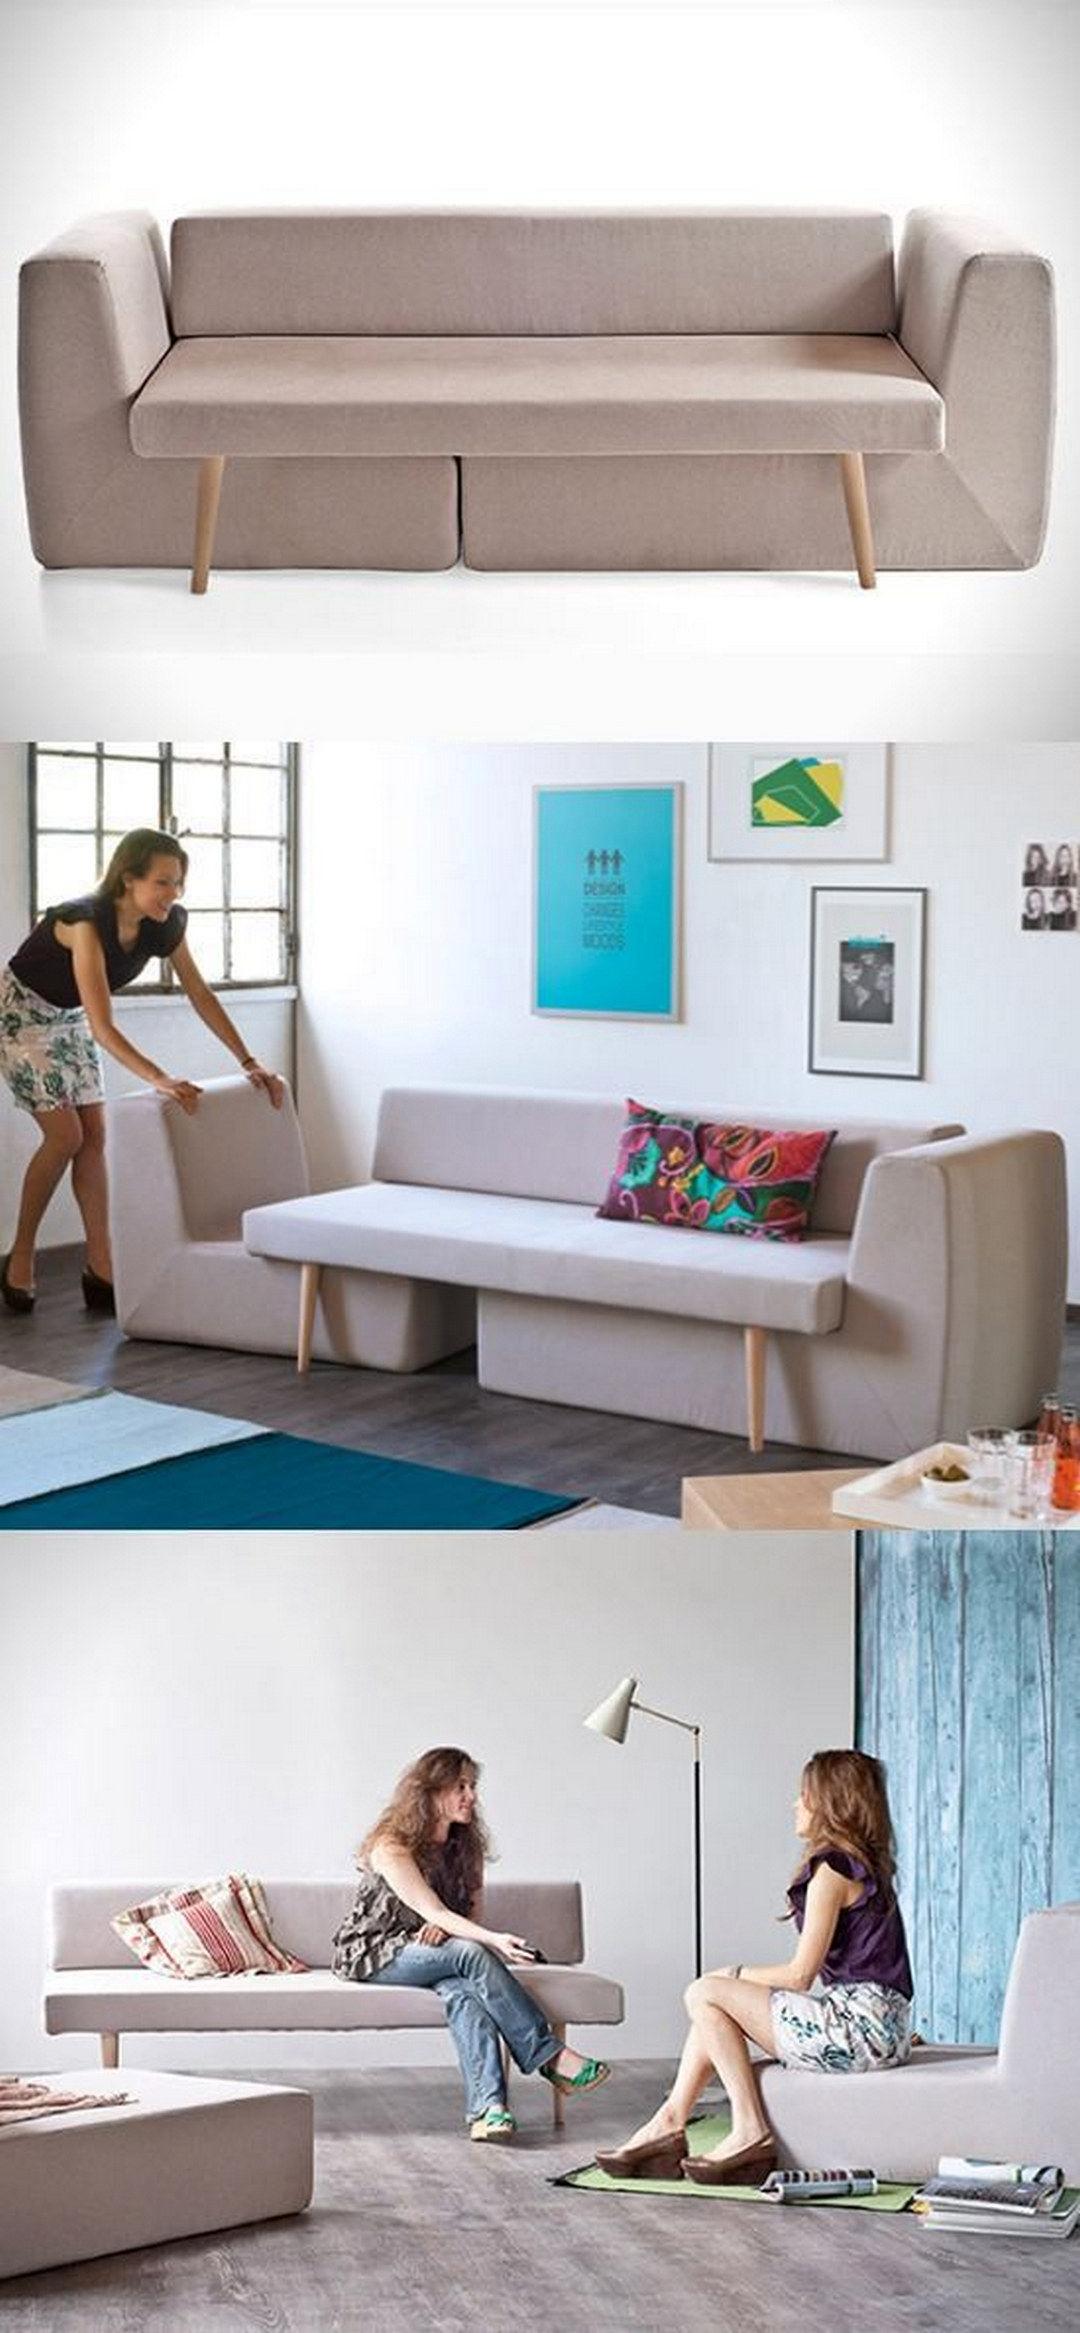 27 Coolest Modular Furniture Designs httpswwwfuturistarchitecturecom12316 modular furniturehtml